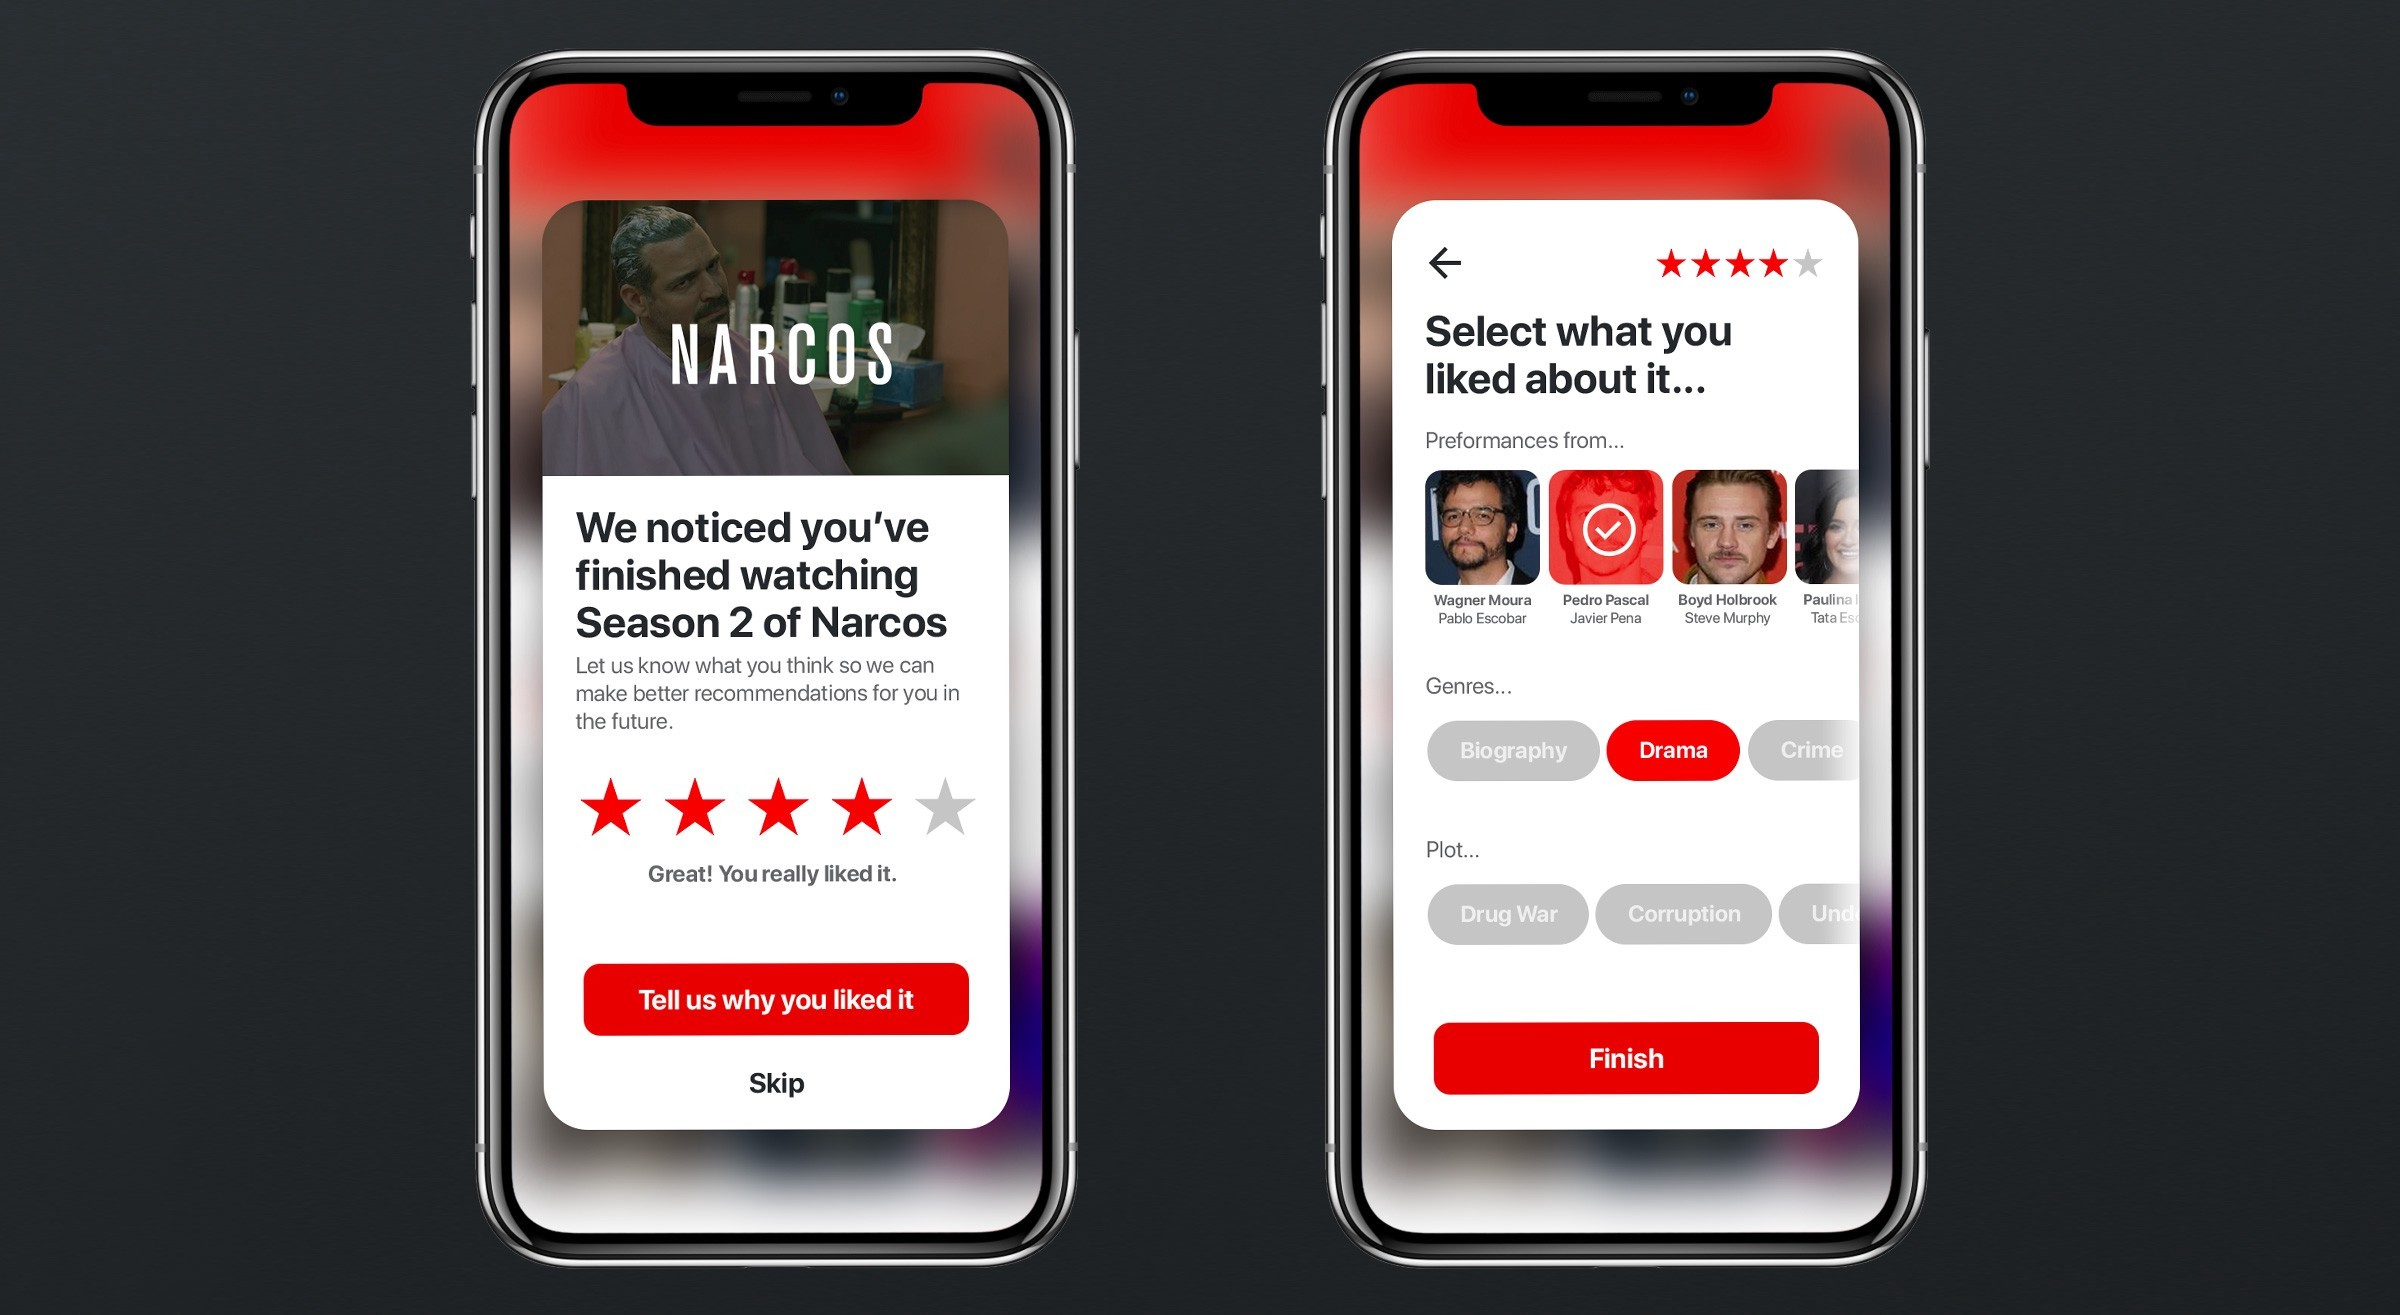 Narcos on Netflix - OTT platform